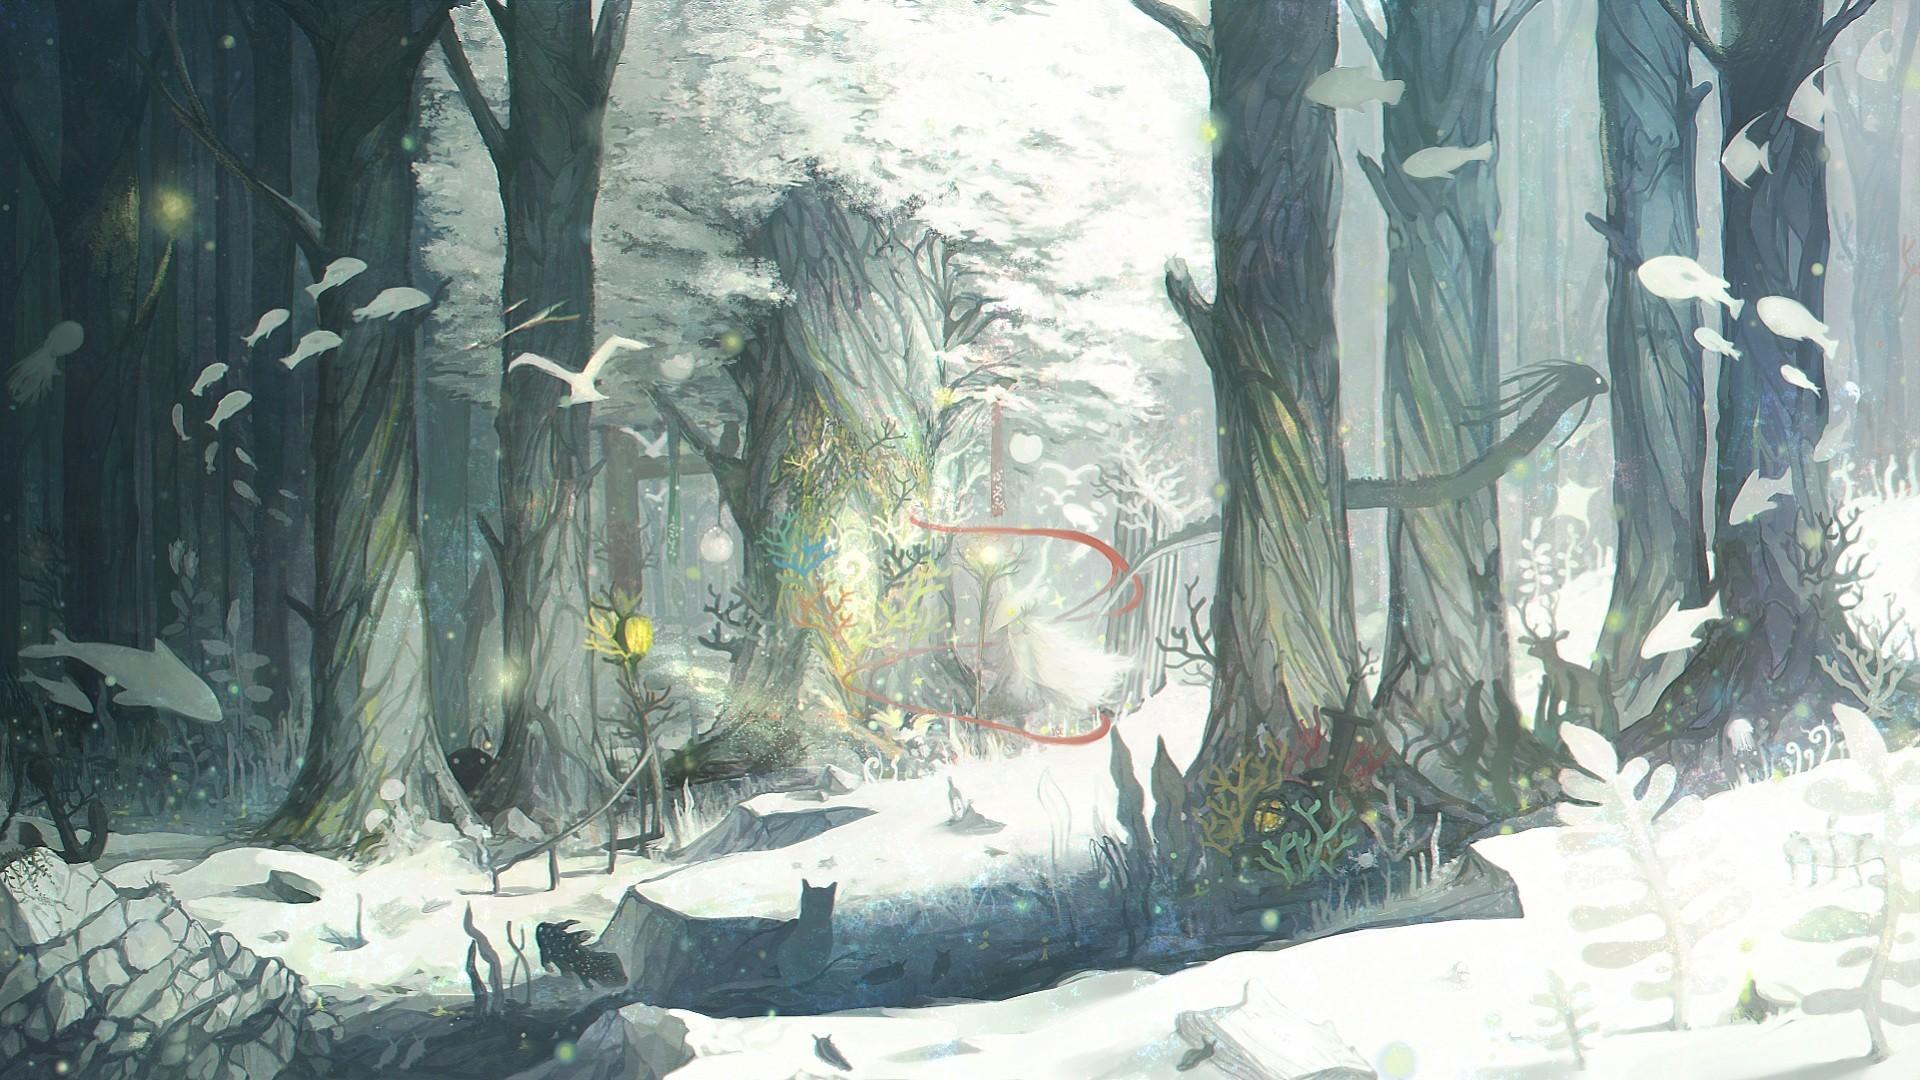 … Fantasy Forest 1080p Wallpaper